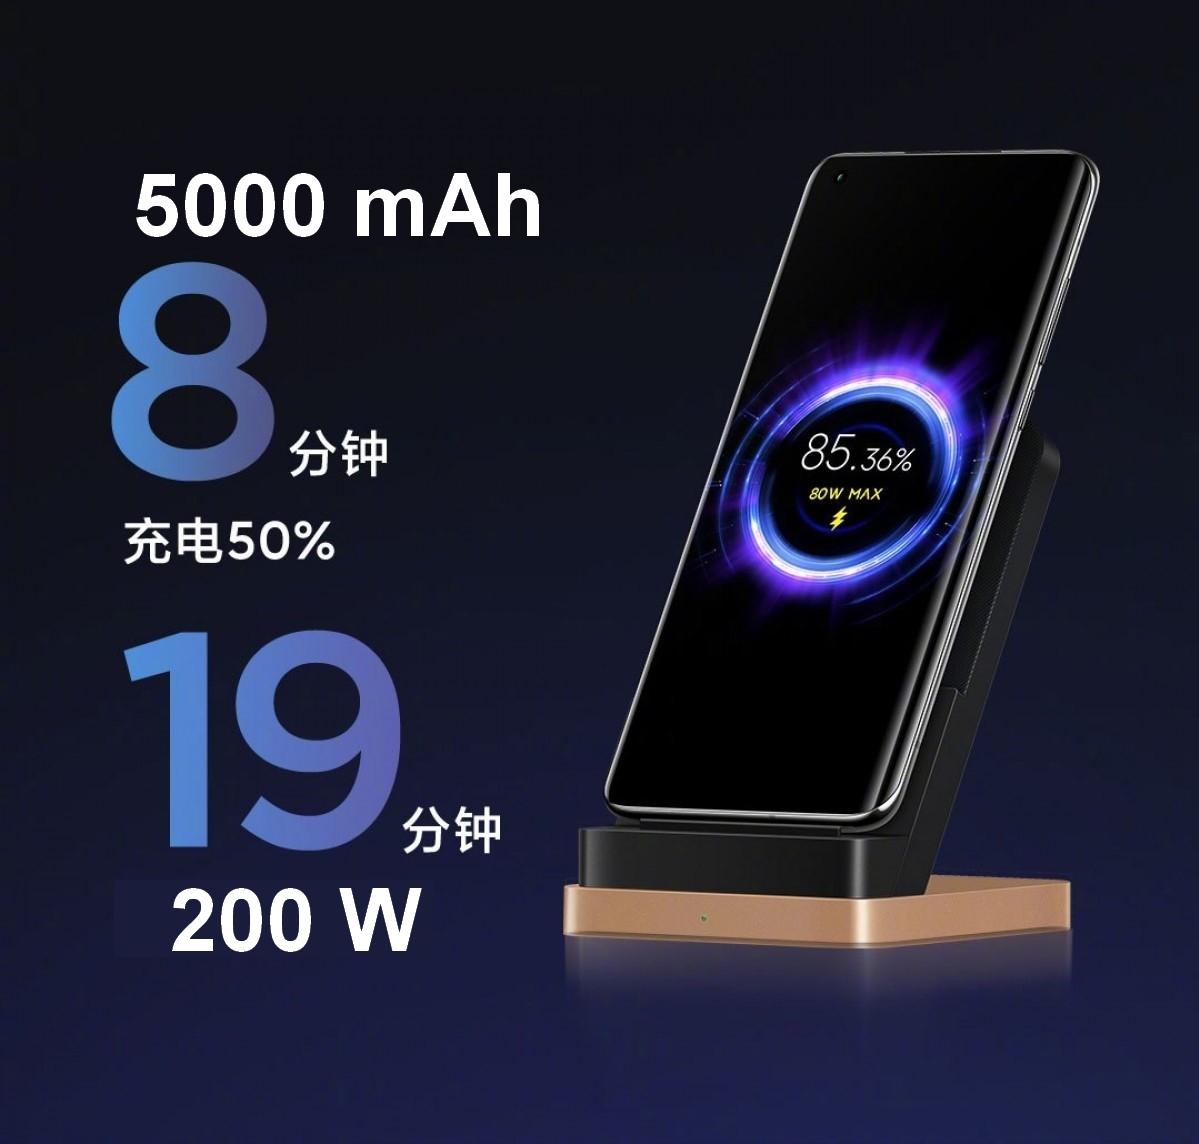 xiaomi-200w-charge-Smartphonegreece (3)